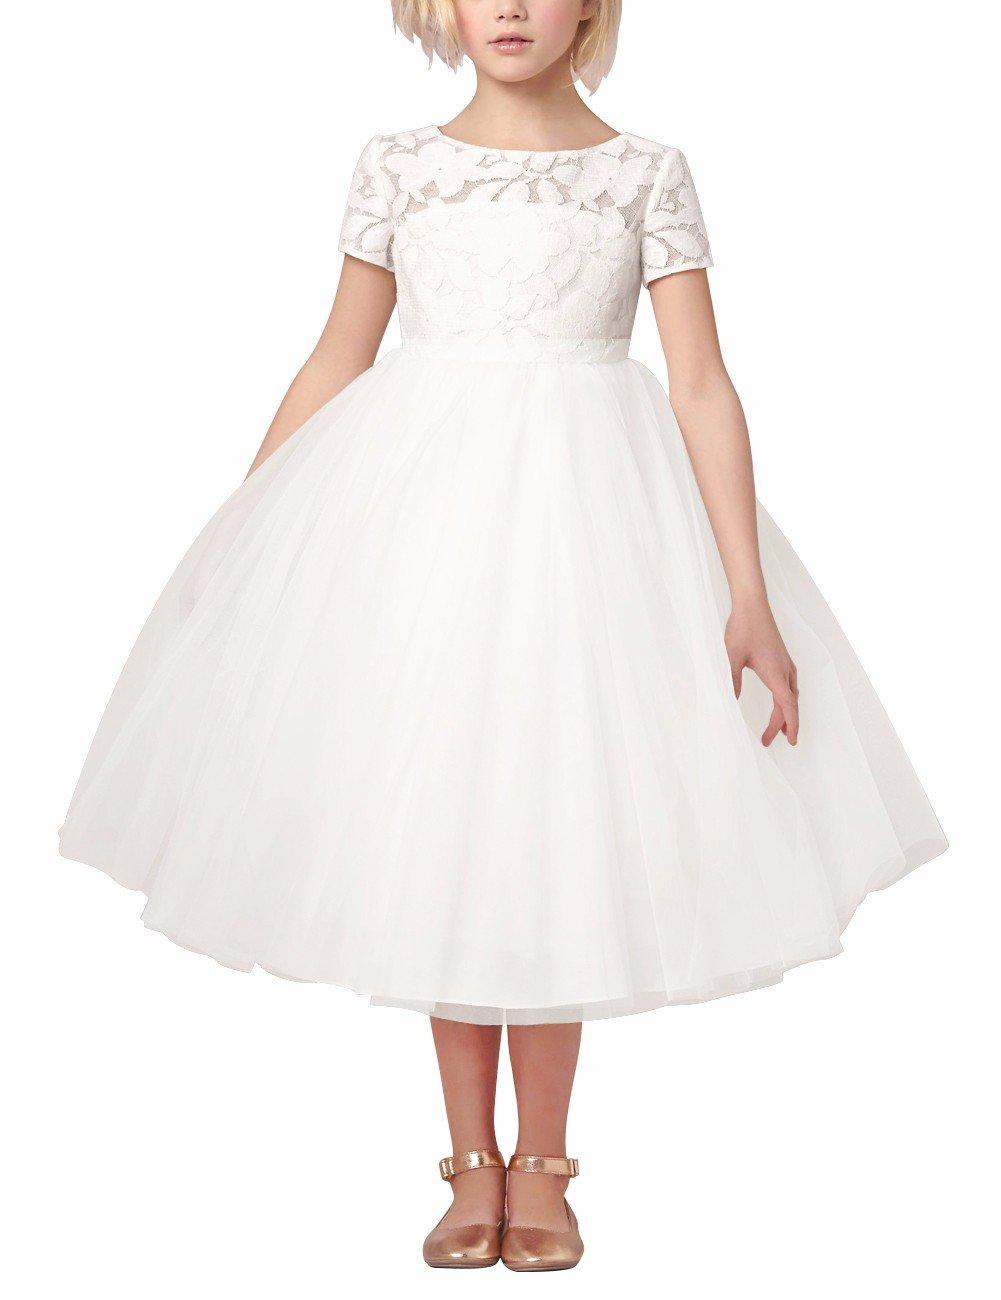 Fancy Dress for Kids: Amazon.com